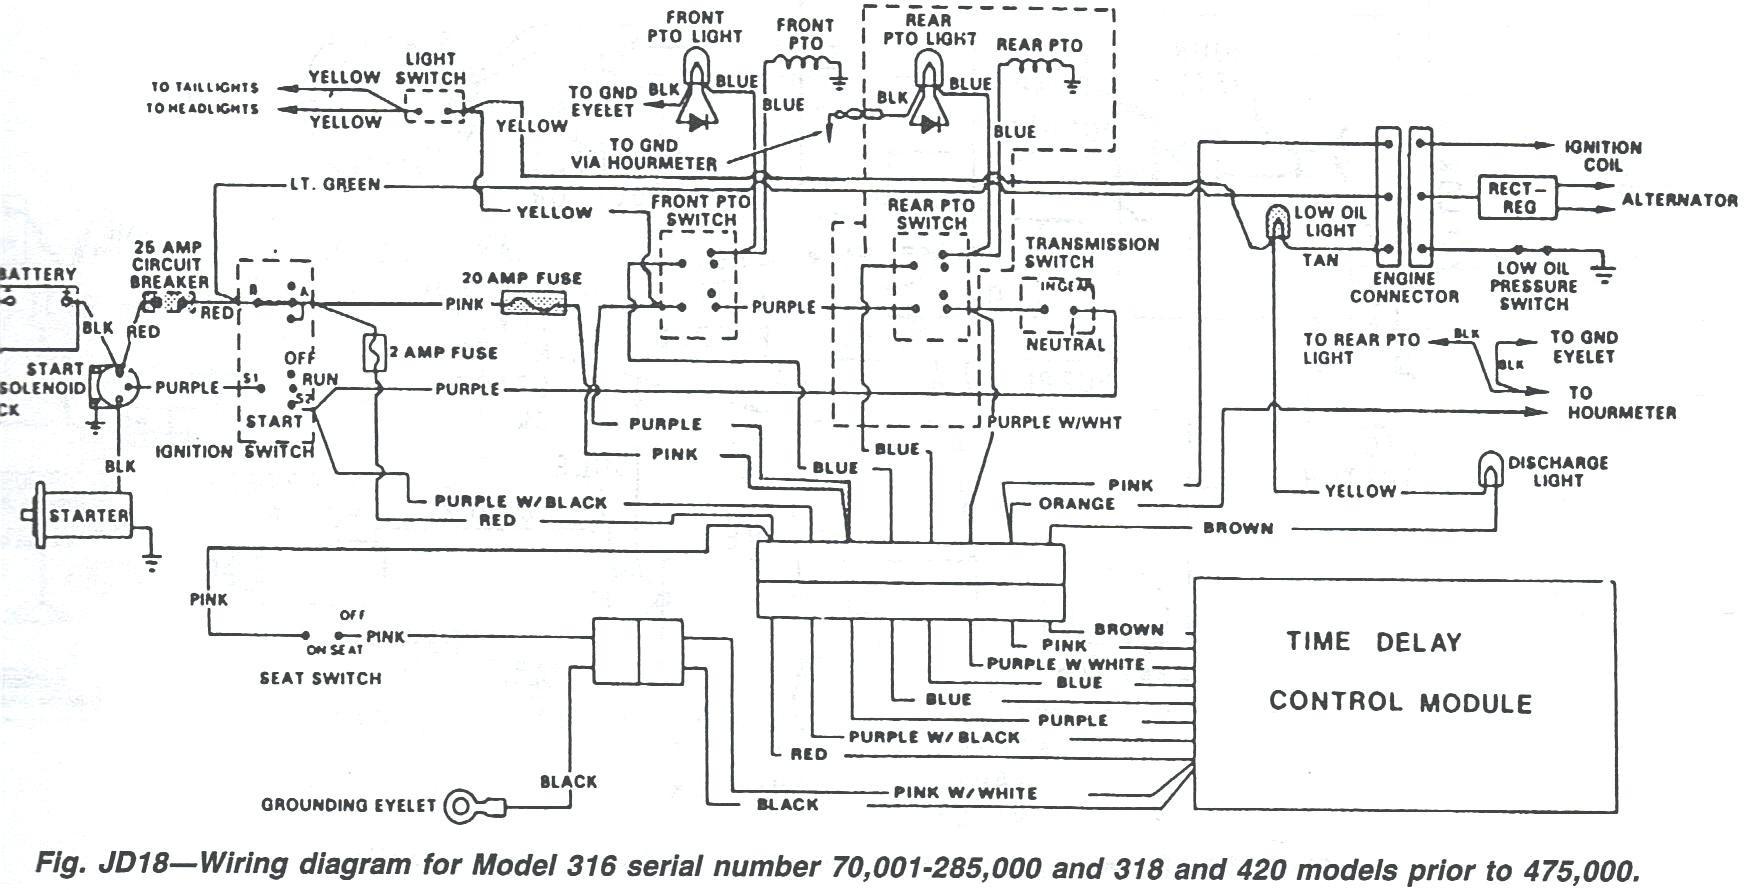 John Deere 4020 Electrical Diagram - Wiring Diagram 500 on john deere 4440 transmission, john deere m wiring-diagram, john deere 4440 hydraulic system diagram, john deere 4430 wiring-diagram, john deere 155c wiring-diagram, john deere 325 wiring-diagram, john deere 425 wiring-diagram, john deere 455 wiring-diagram, john deere 4440 cylinder head, john deere ignition switch diagram, john deere 3020 electrical diagram, john deere 4440 information, john deere 4440 accessories, john deere 322 wiring-diagram, john deere 4020 wiring schematic, john deere 345 wiring-diagram, john deere 4440 electrical, john deere 320 wiring-diagram, john deere 4100 wiring-diagram, john deere lawn tractor electrical diagram,